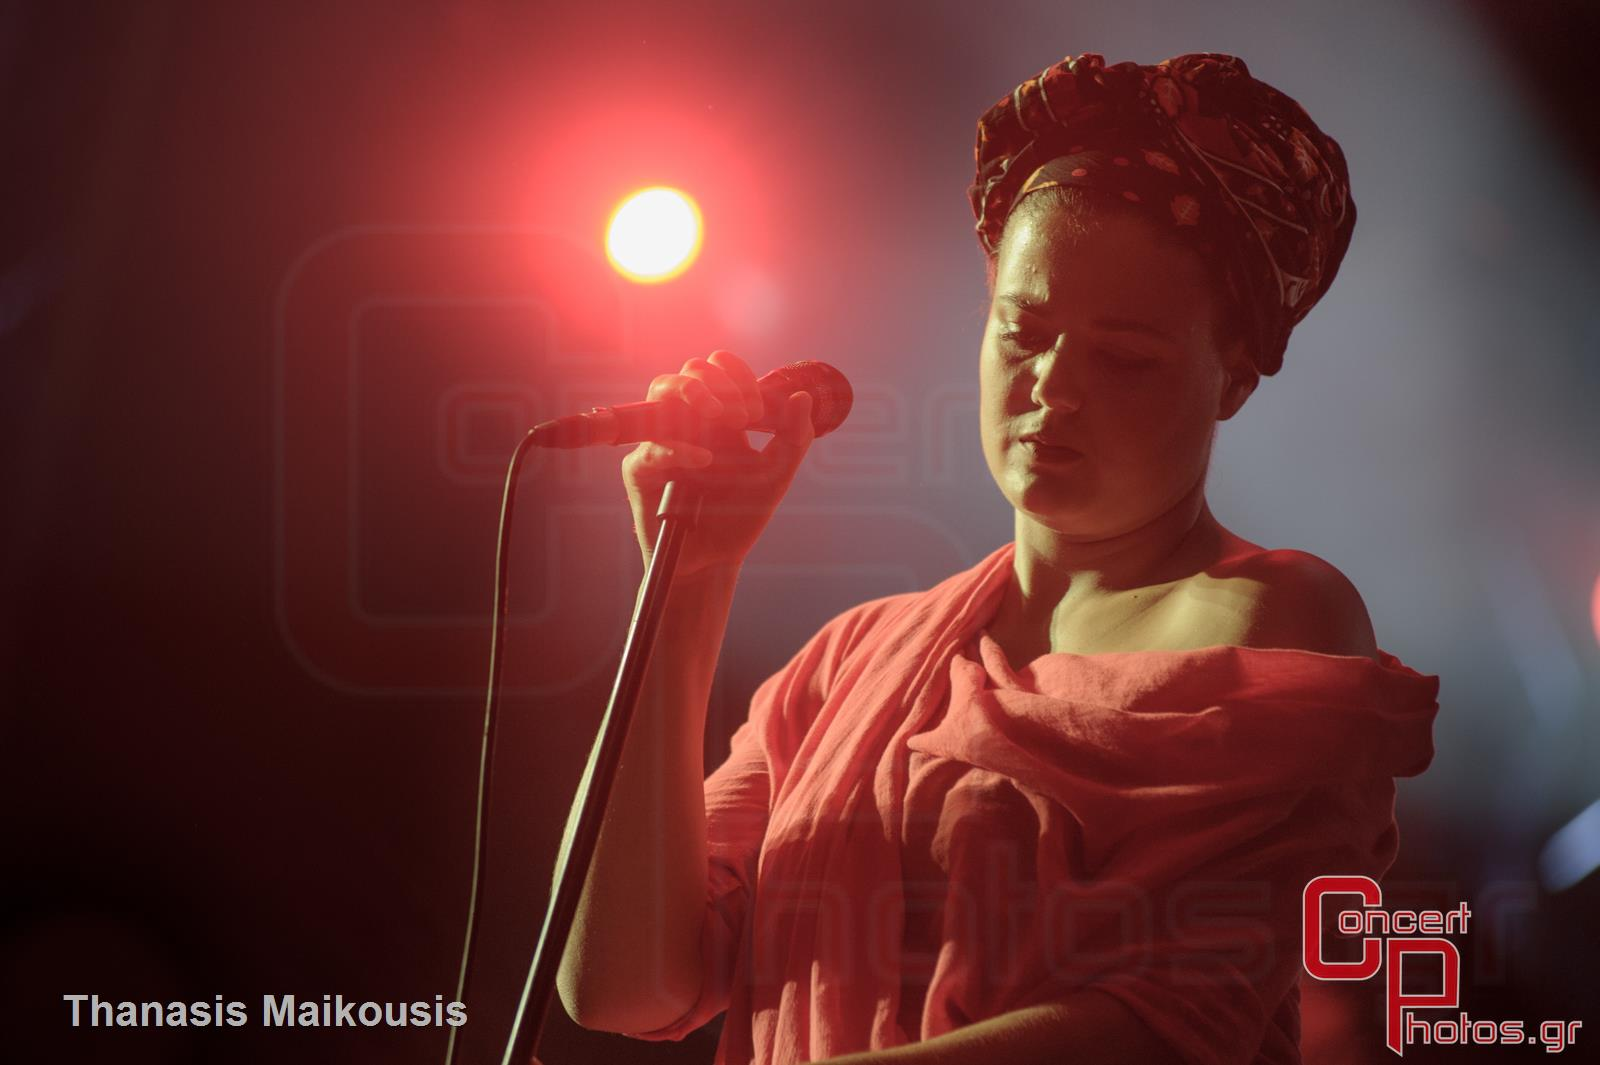 Active Member - Τραγούδα μας να φύγει το σκοτάδι- photographer: Thanasis Maikousis - concertphotos_-4856